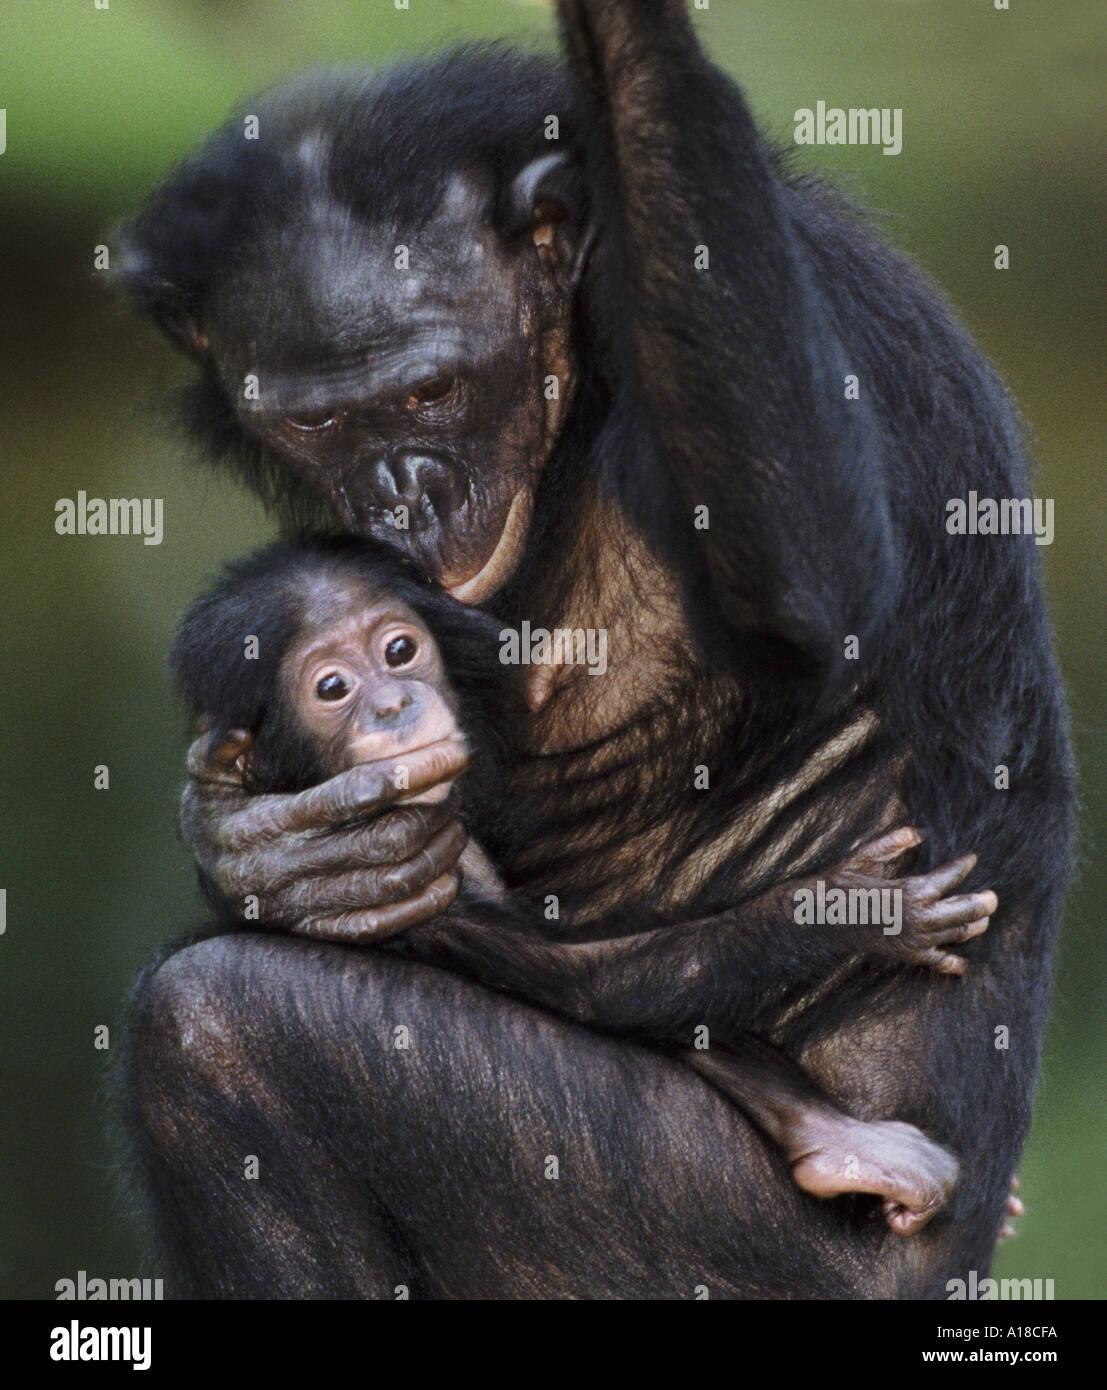 Mother and baby bonobo - Stock Image